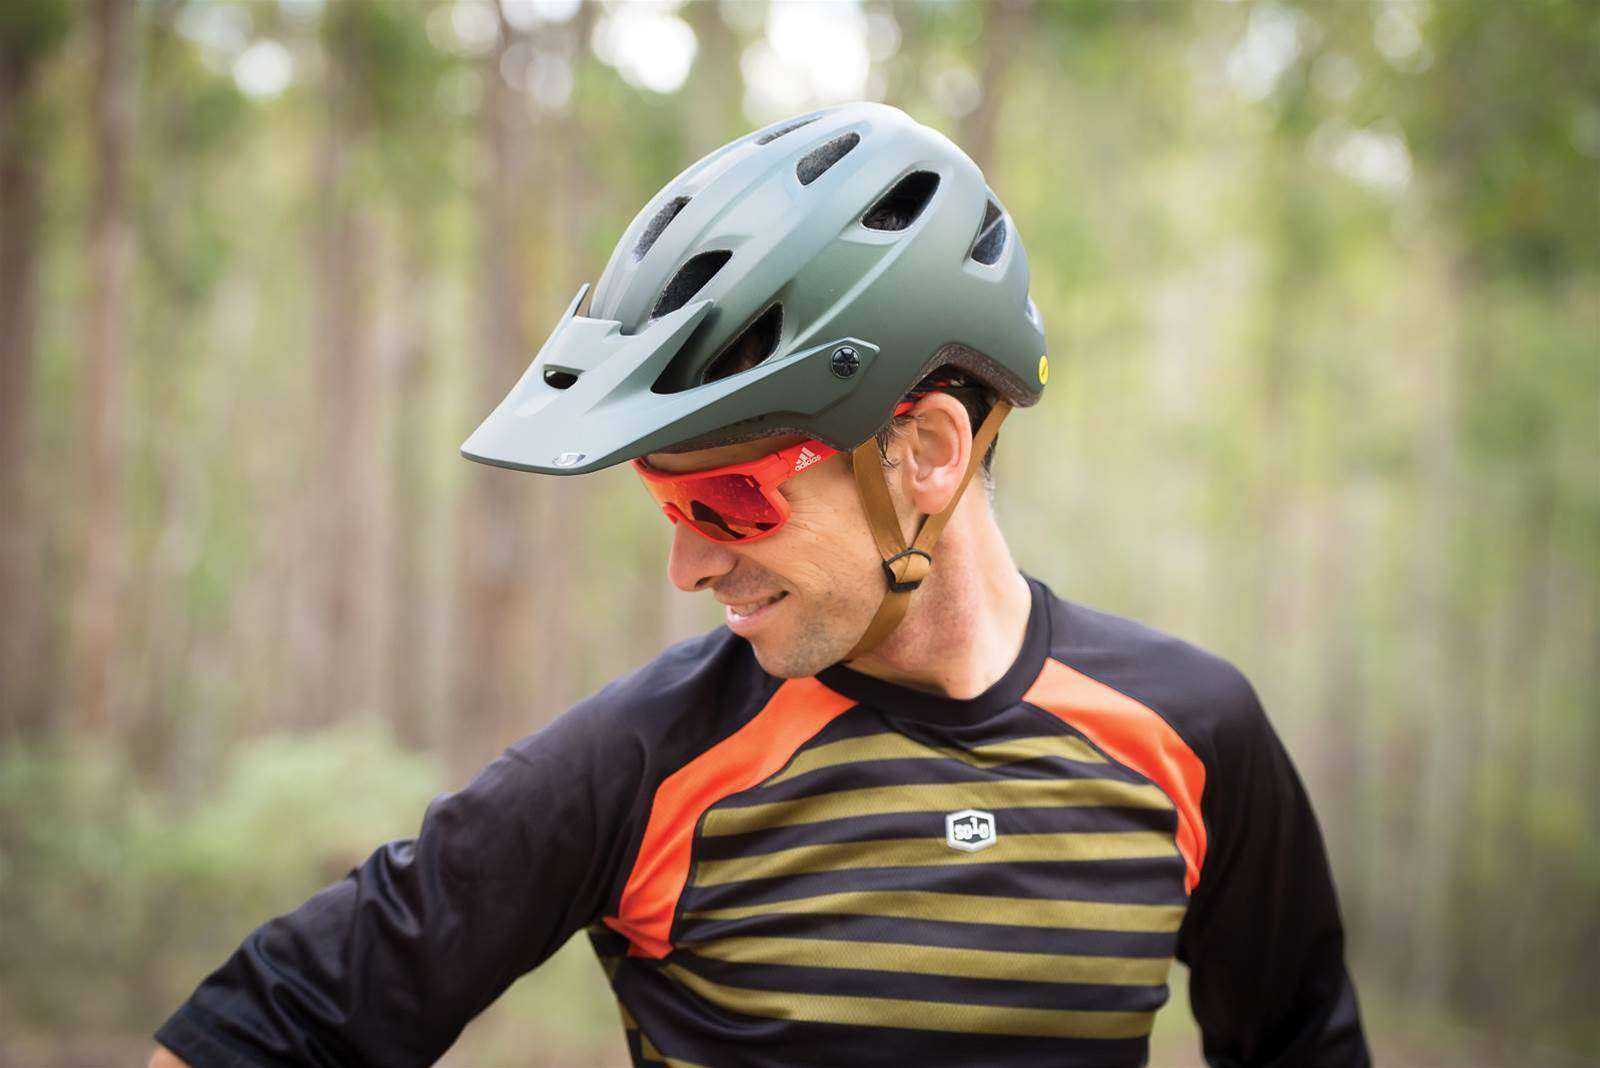 TESTED: Giro chronicle MIPS helmet